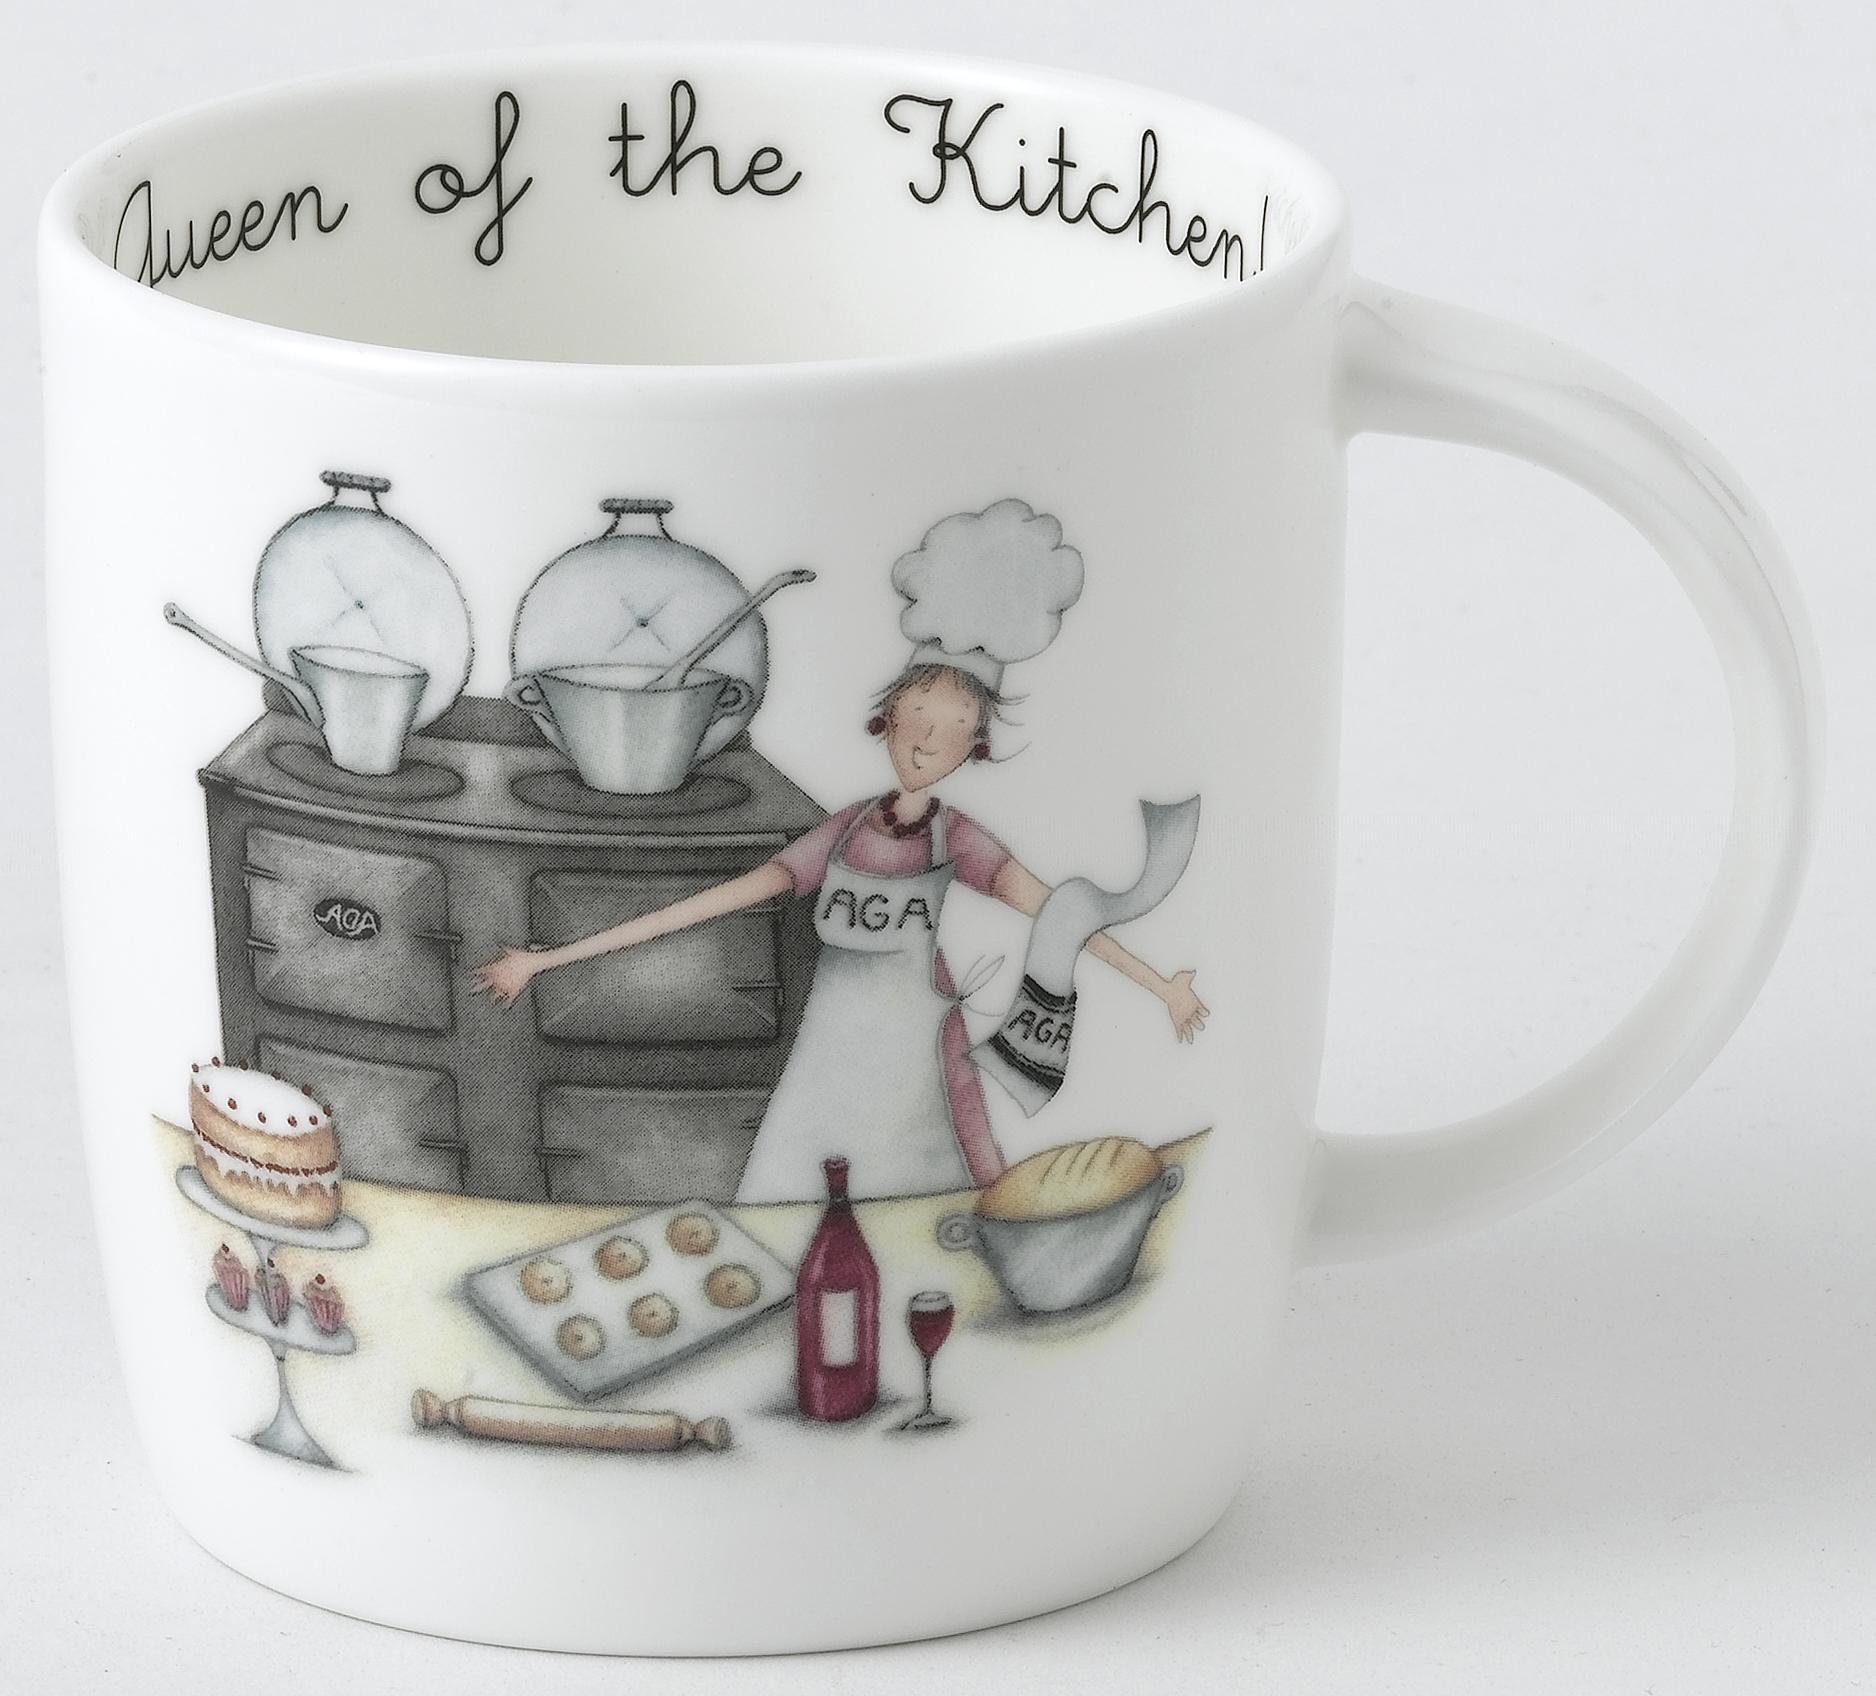 AGA Mug Designs by Berni Parker - Queen of the Kitchen